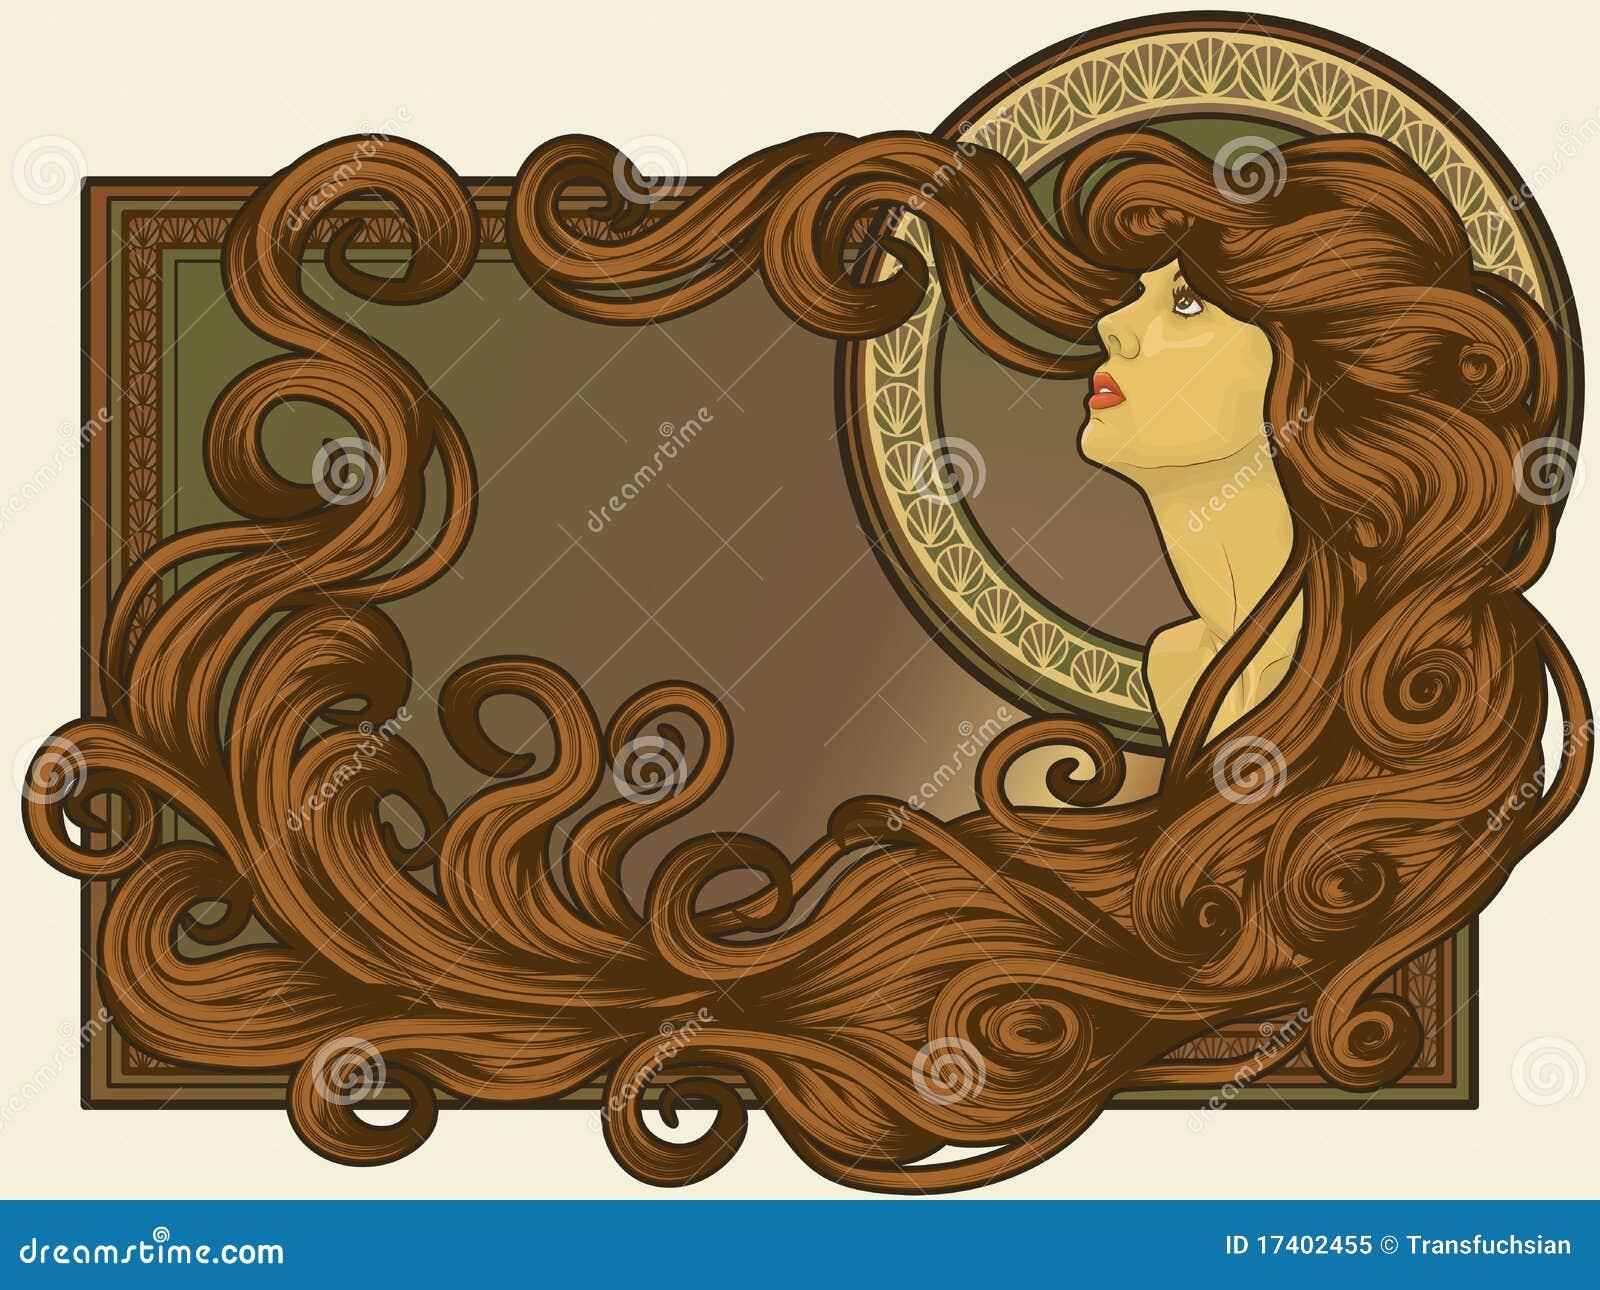 A arte Nouveau denominou a face da mulher com cabelo longo